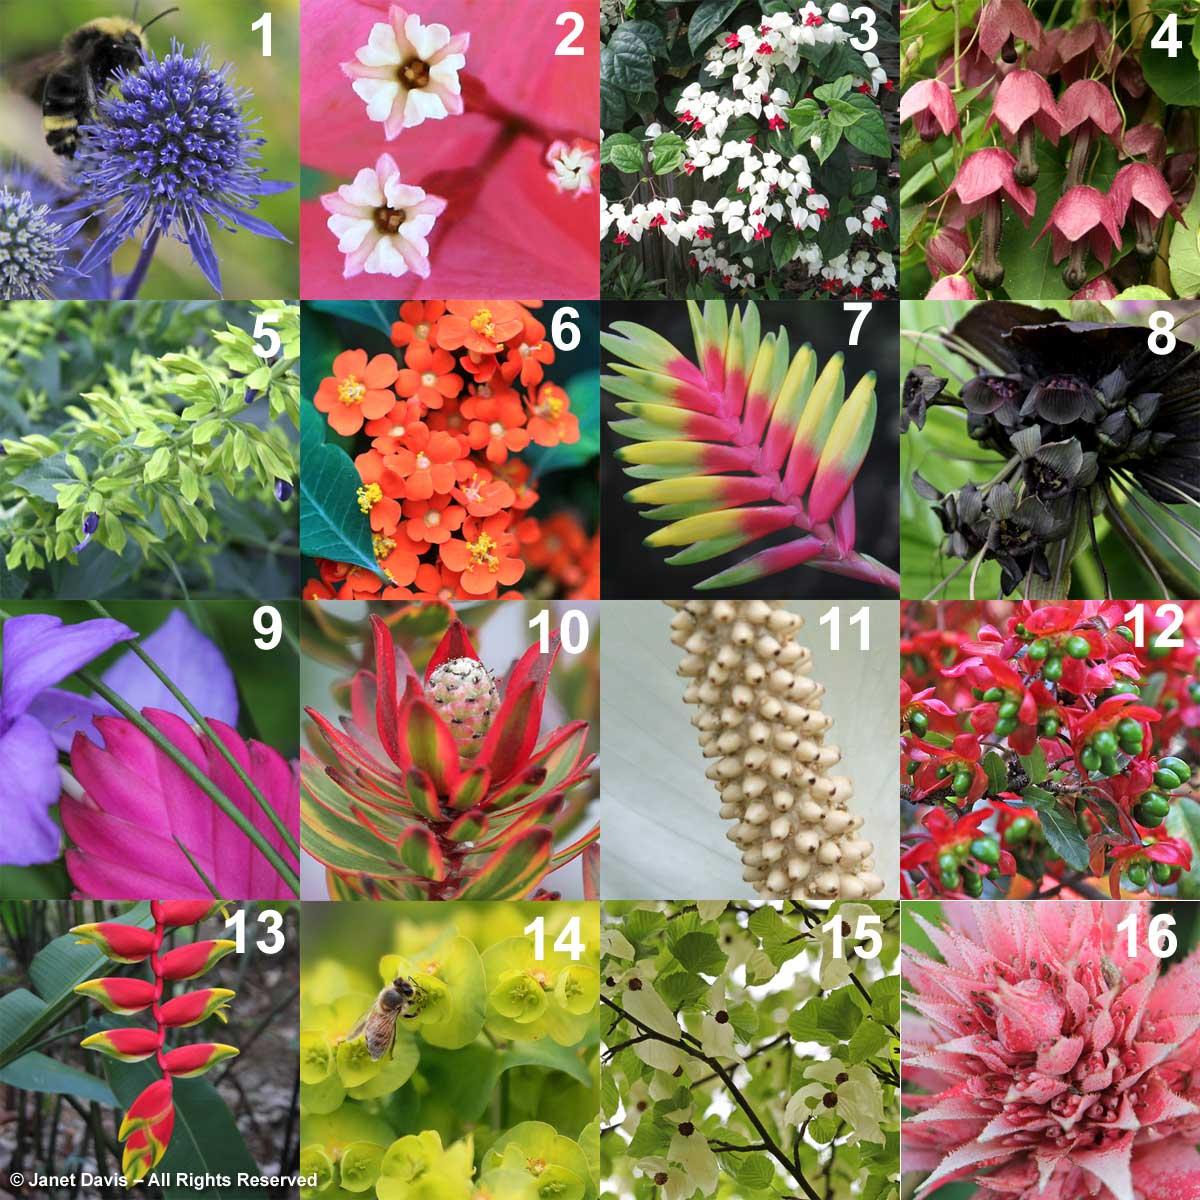 """LOVED THOSE BRACTS"" (yes, they're all bracts) 10. Leucadendron 'Jester' 12. Ochna serrulata 7. Vriesea carinata 1. Eryngium planum 15. Davidia involucrata 9. Tillandsia cyanea 13. Heliconia rostrata 6. Euphorbia fulgens 5. Salvia mexicana 'Limelight' 14. Euphorbia amygdaloides 'Purpurea' 2. Bougainvillea glabra 4. Rhodochiton atrosanguineus 'Purple Rain' 16. Aechmea fasciata 3. Clerodendrum thomsoniae 8. Tacca chantrieri 11. Spathiphyllum sp."